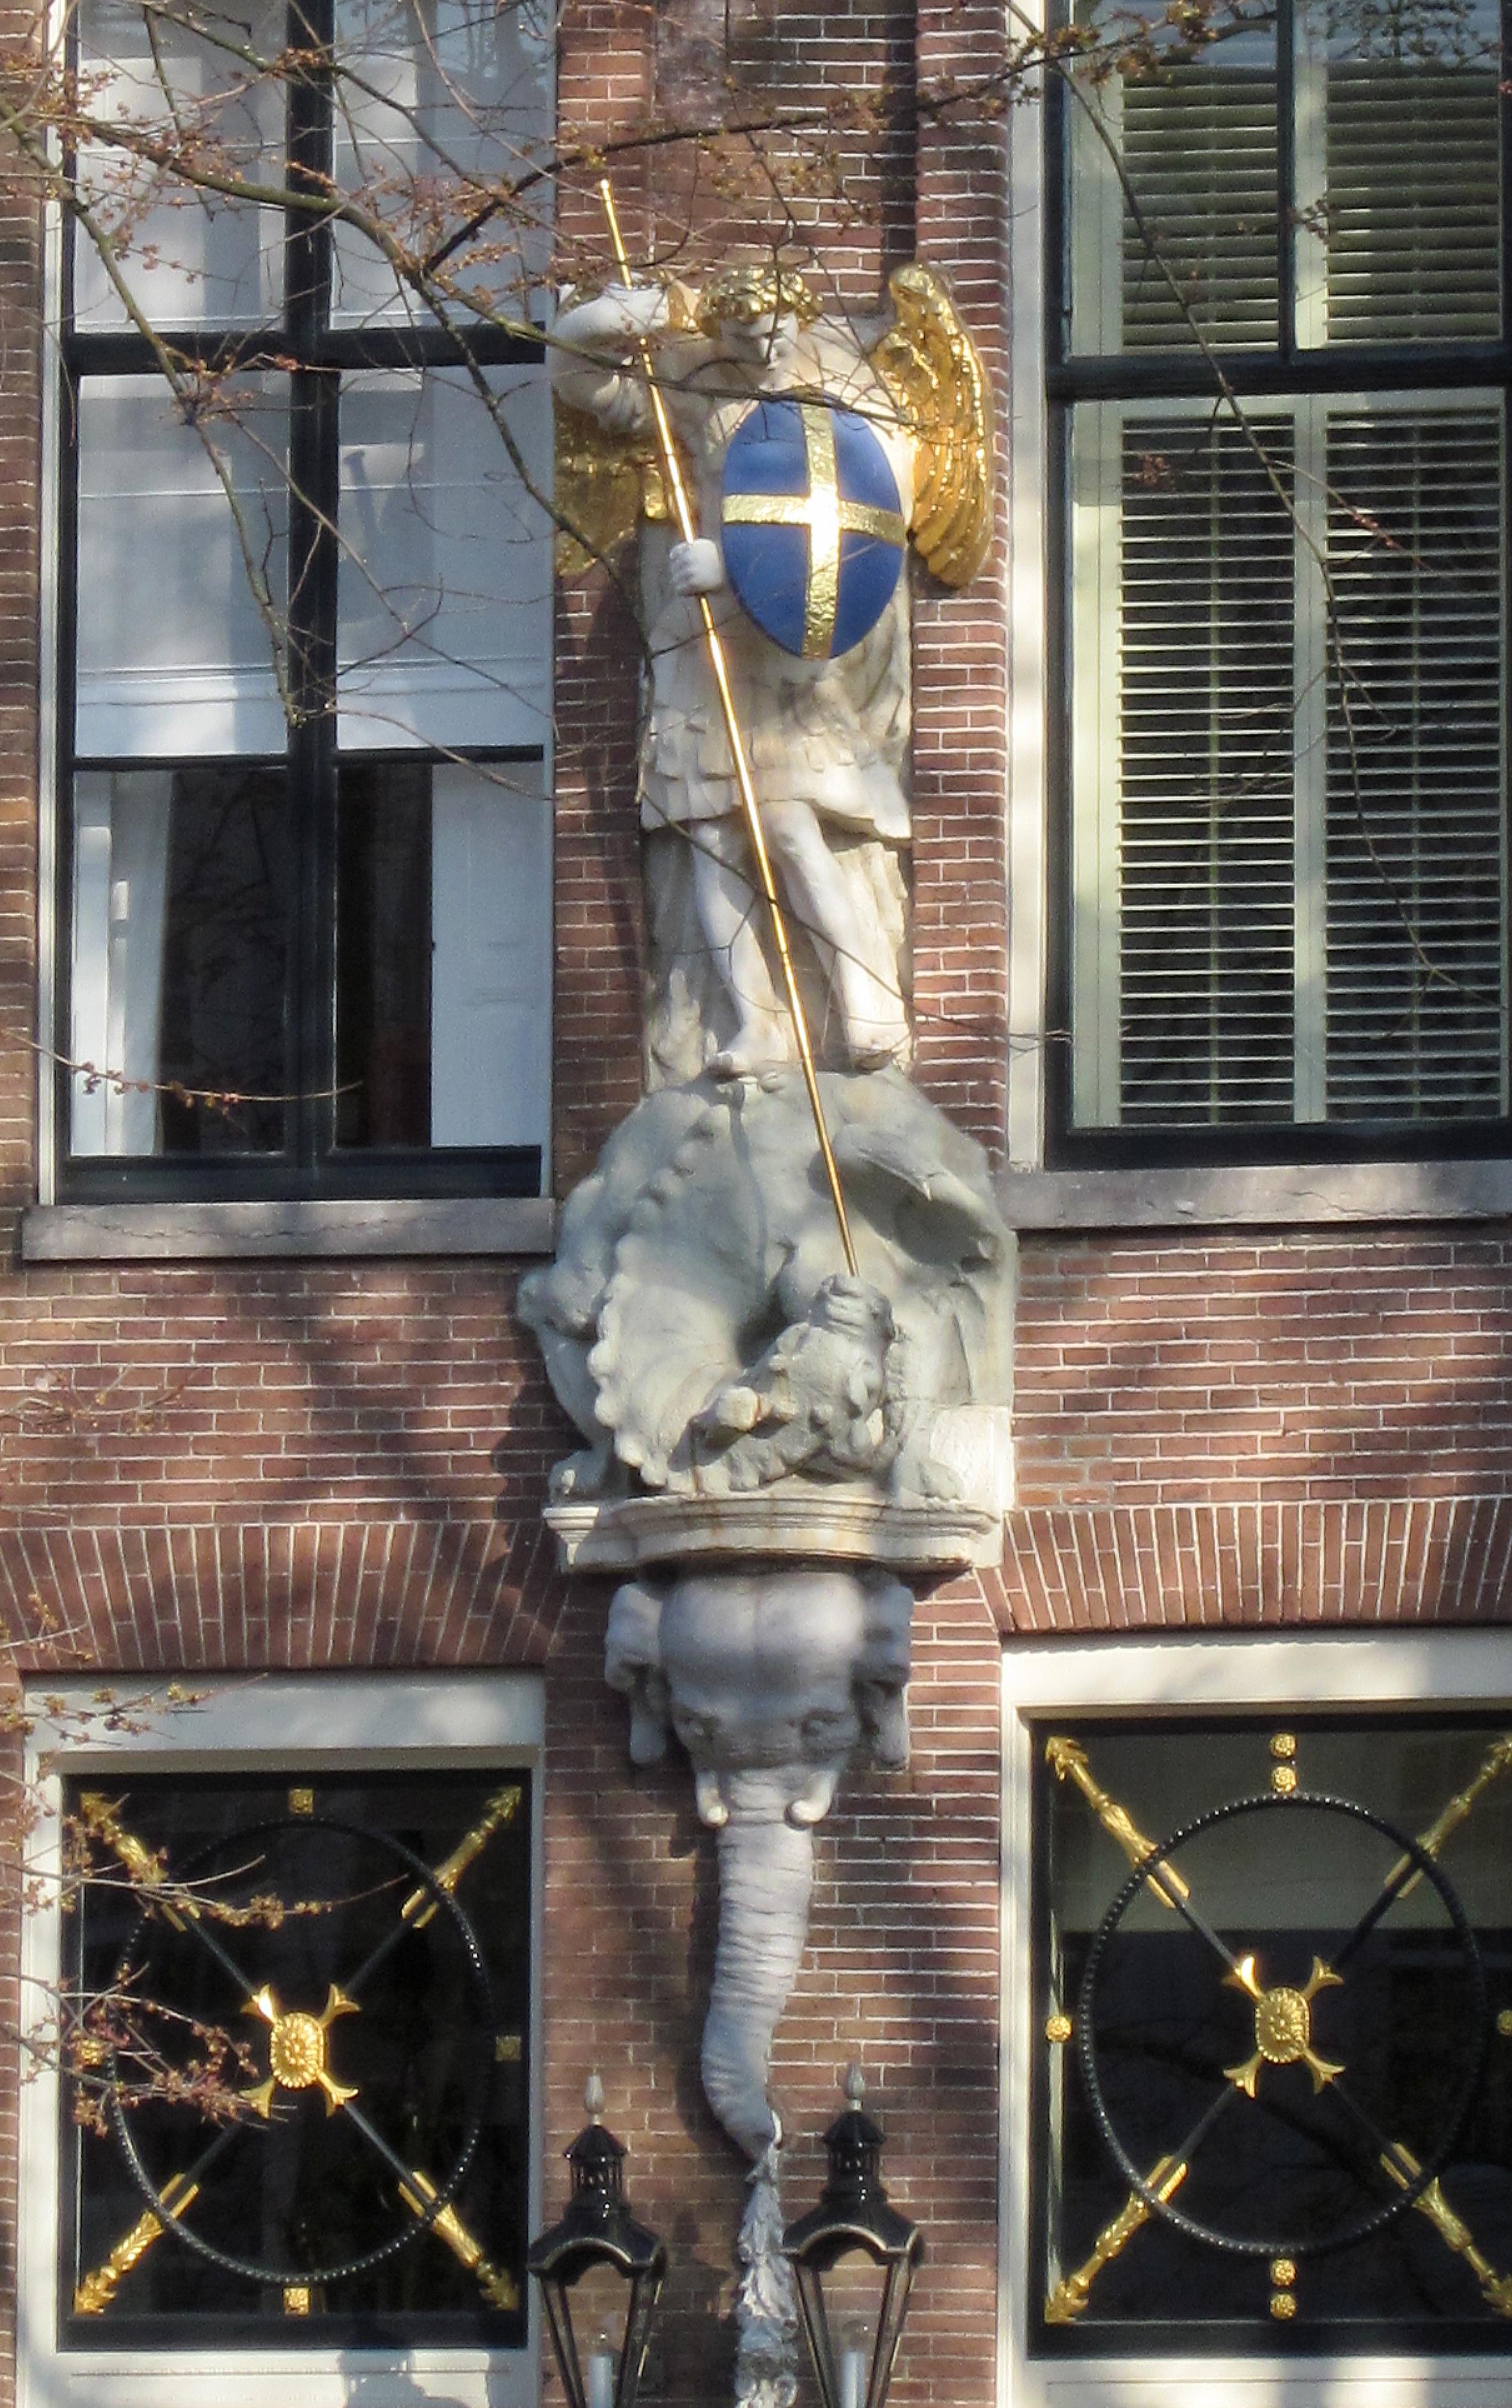 c2b8f0fe96407c File:St.Michael en de Draak Herengracht 571-581 Amsterdam.jpg ...